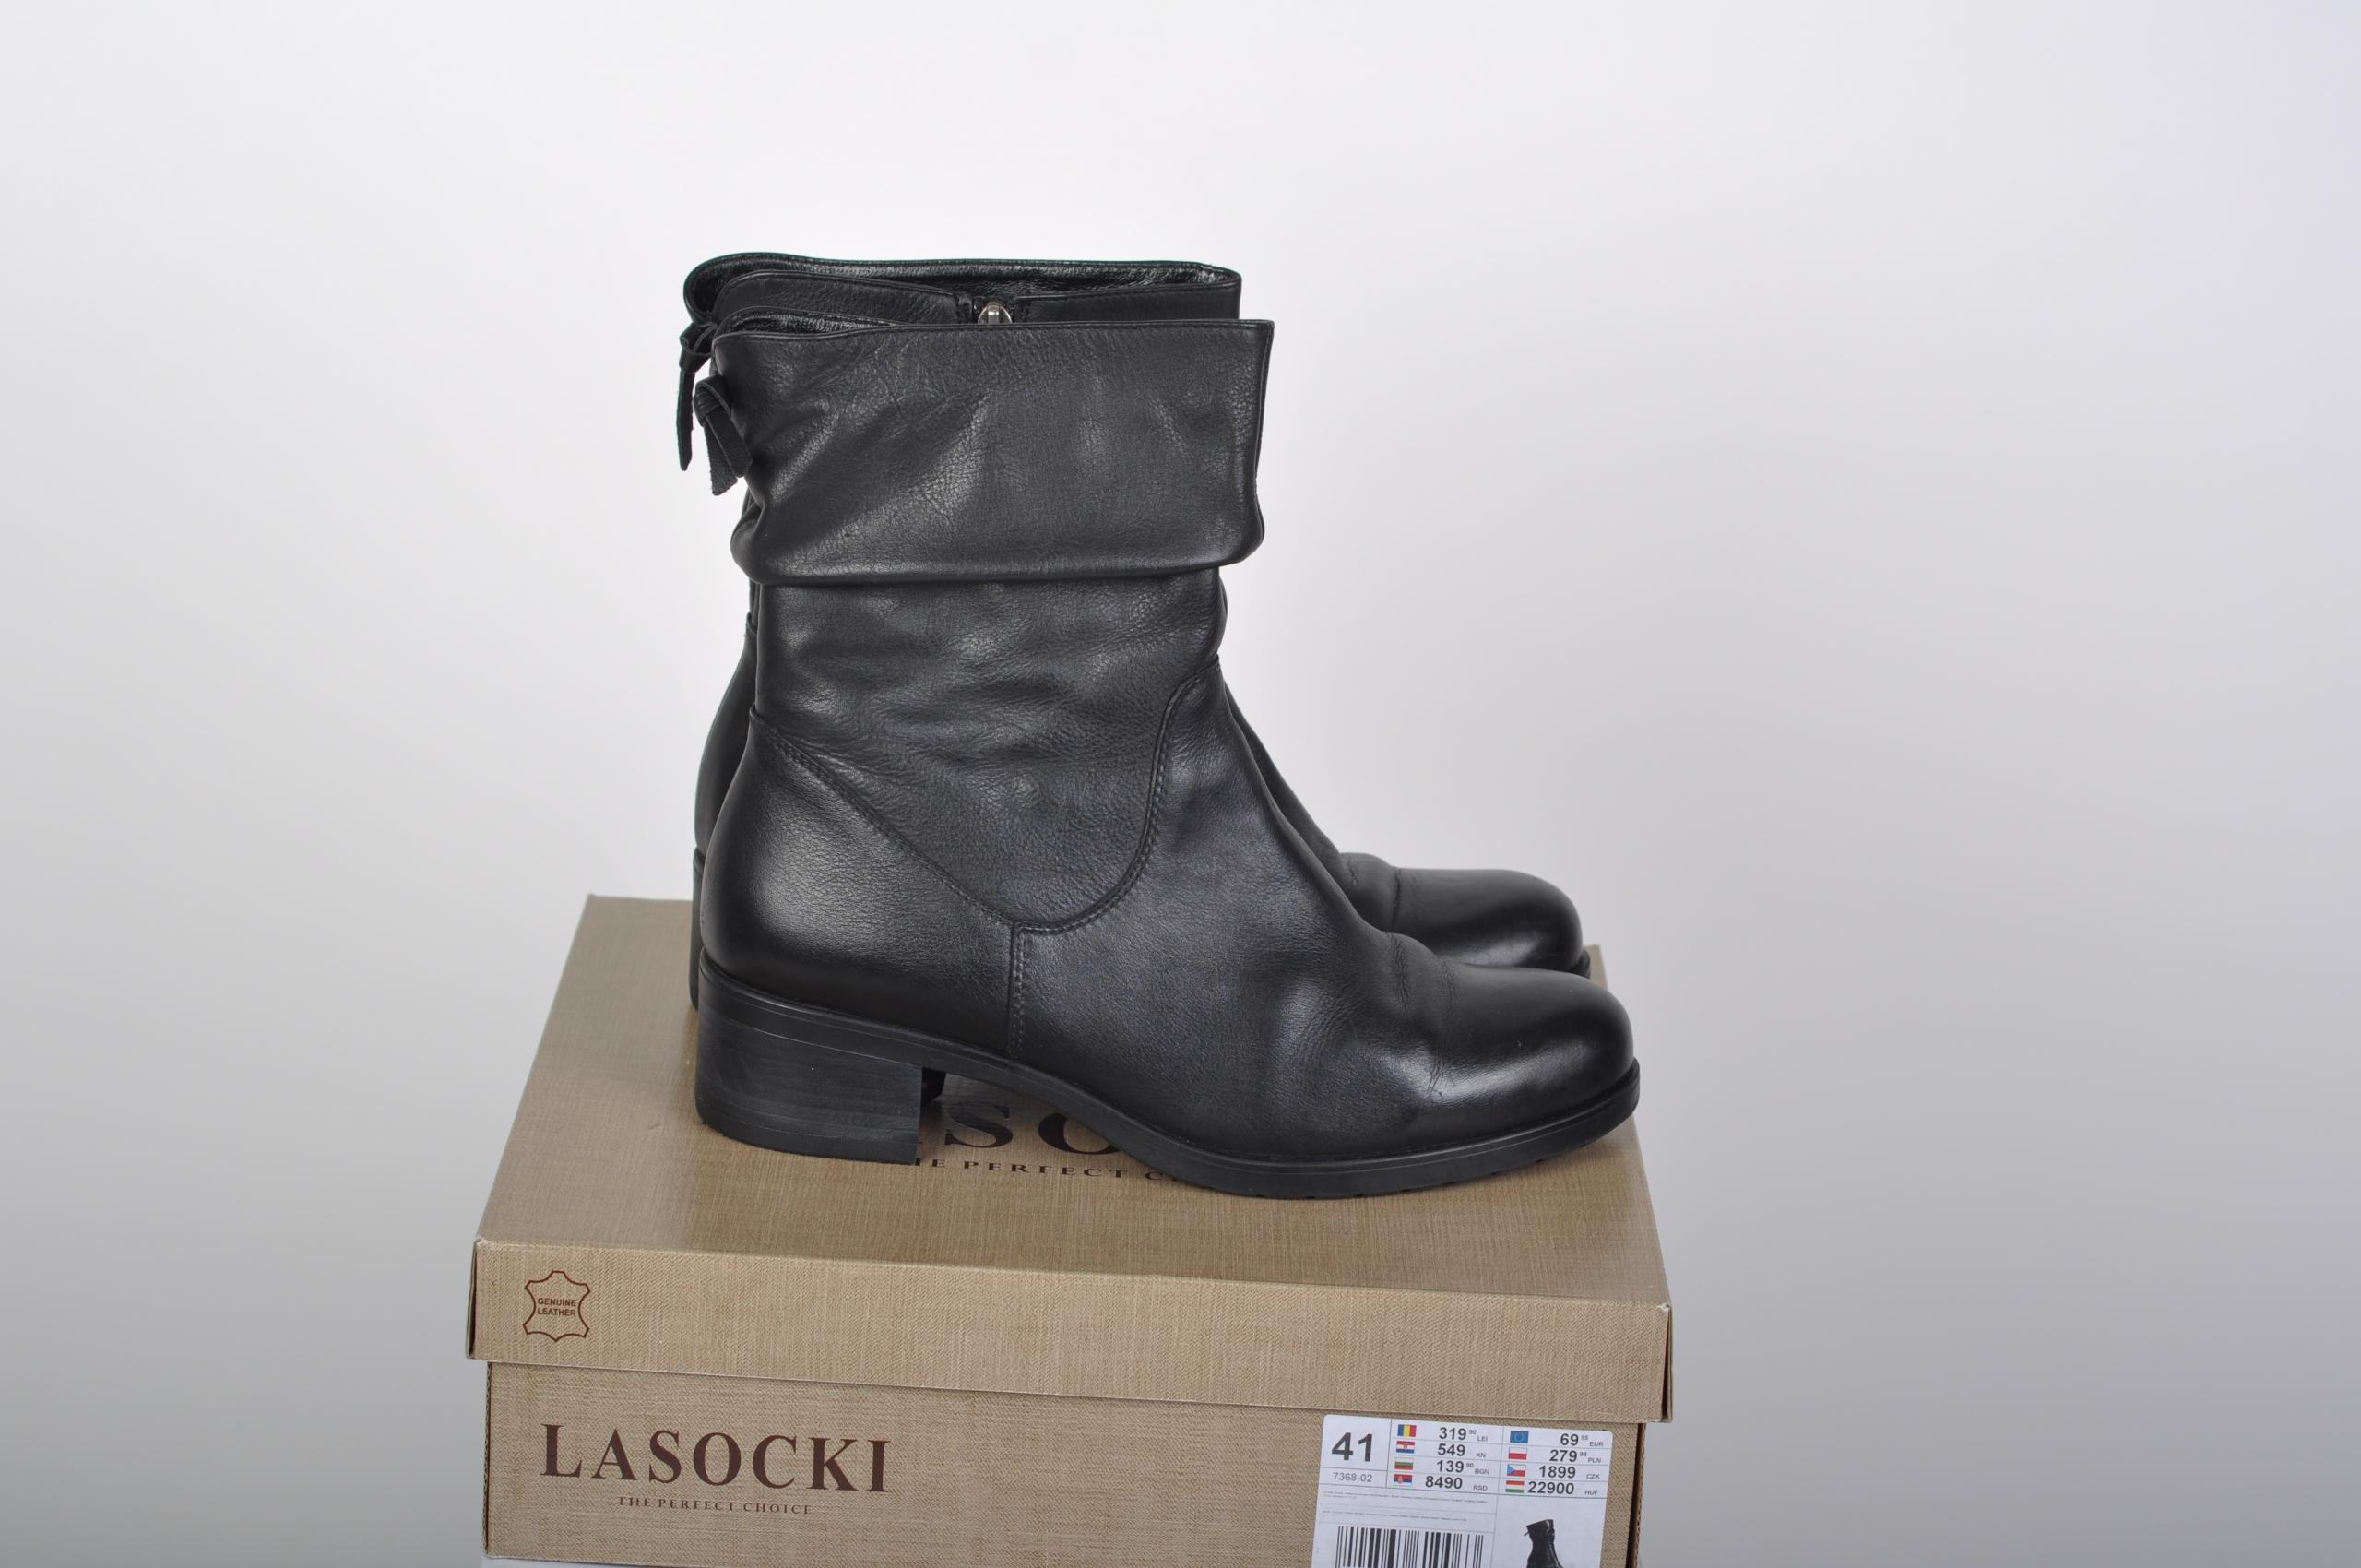 e7af6bb32fcdb LASOCKI czarne botki skóra roz. 41 wkładka 27 cm - 7692476758 ...